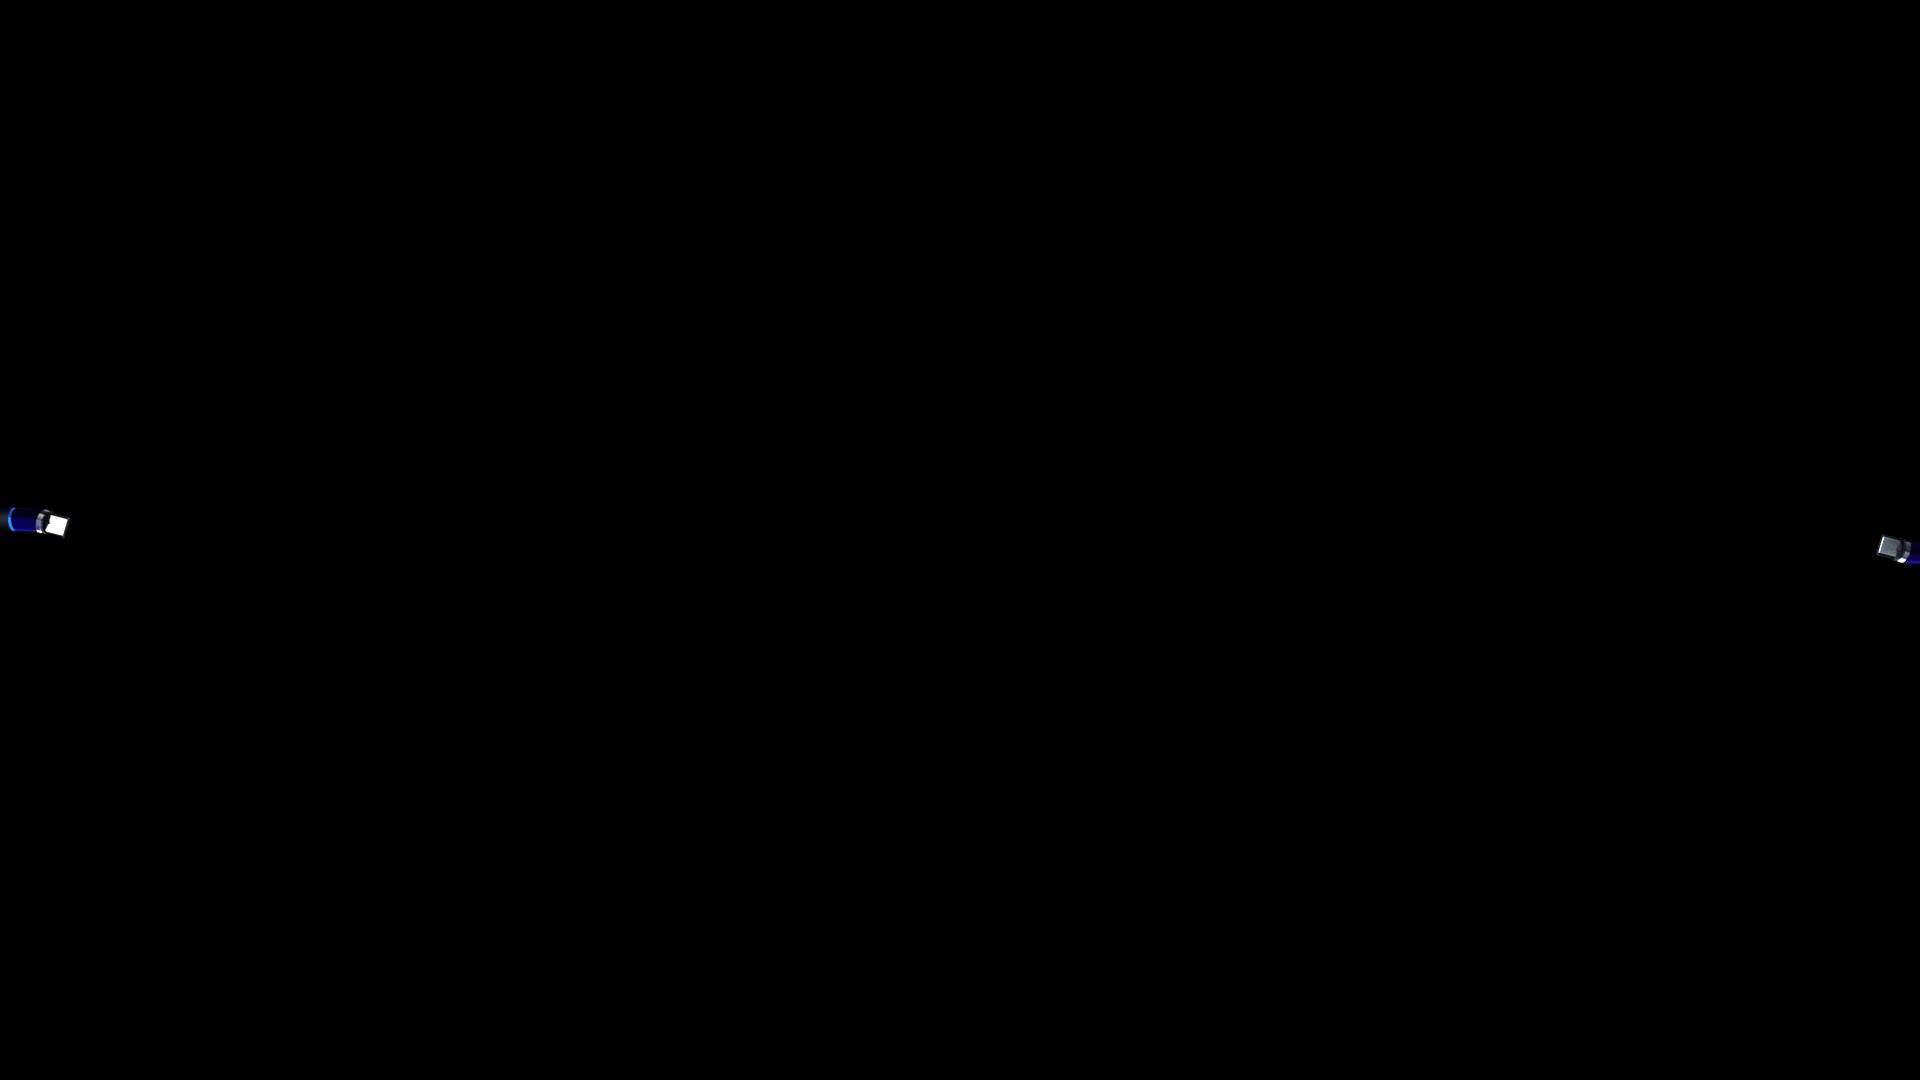 3 em 1 c cabo de Carregador de dados usb cabo de carregamento magnético rodada conector rápido carregamento cabo usb ímã